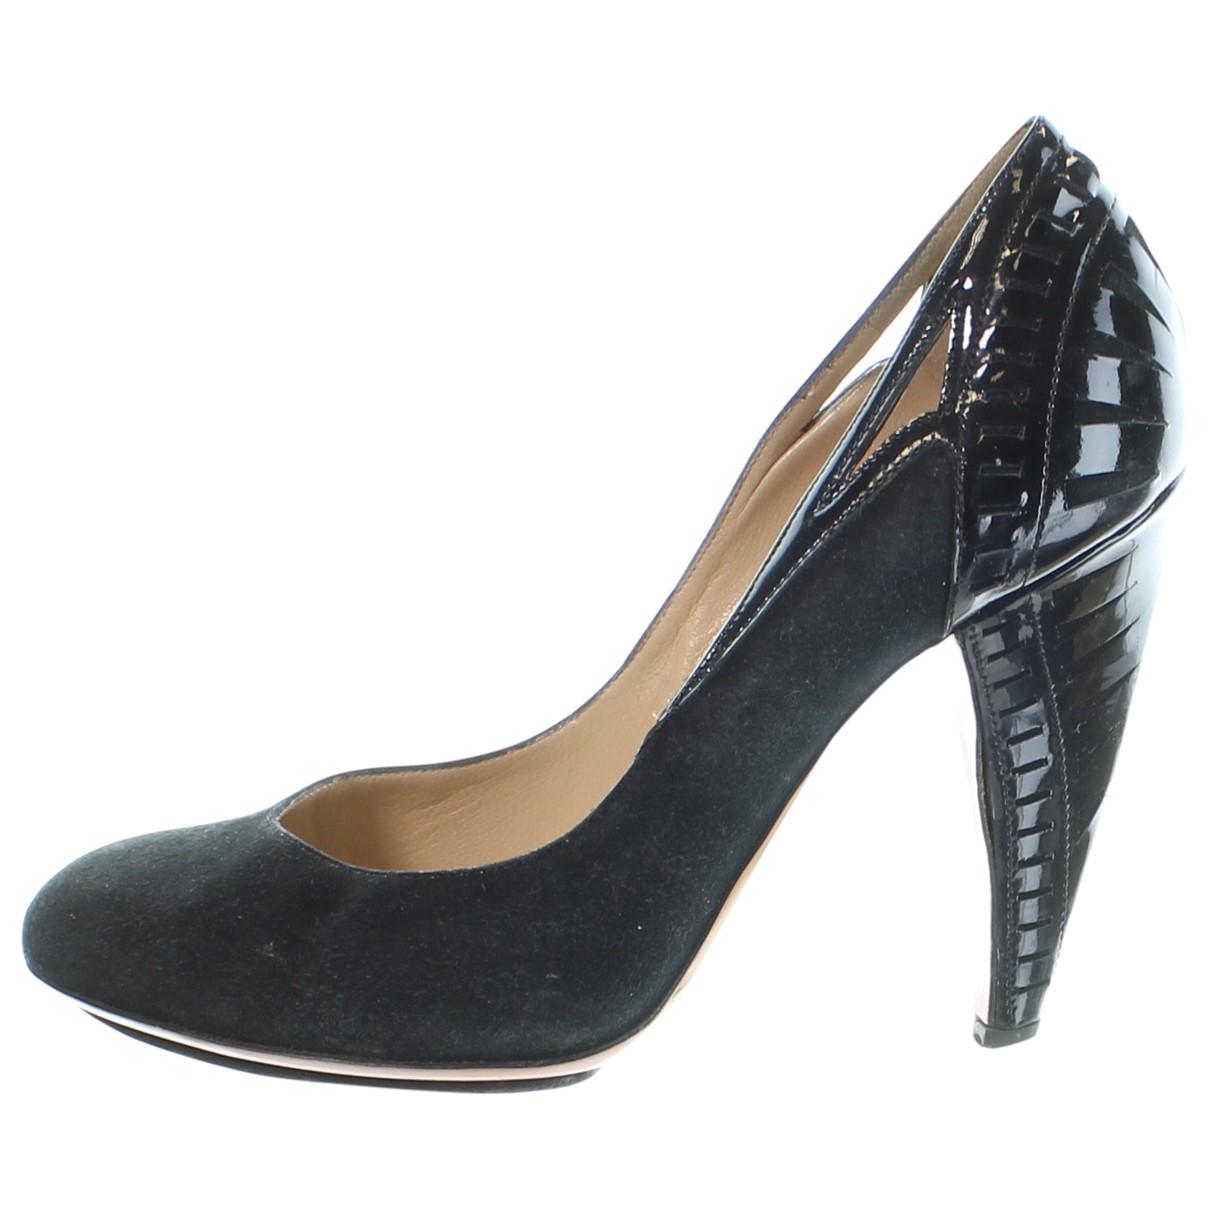 Alberta Ferretti \N Black Suede Heels for Women 37 EU